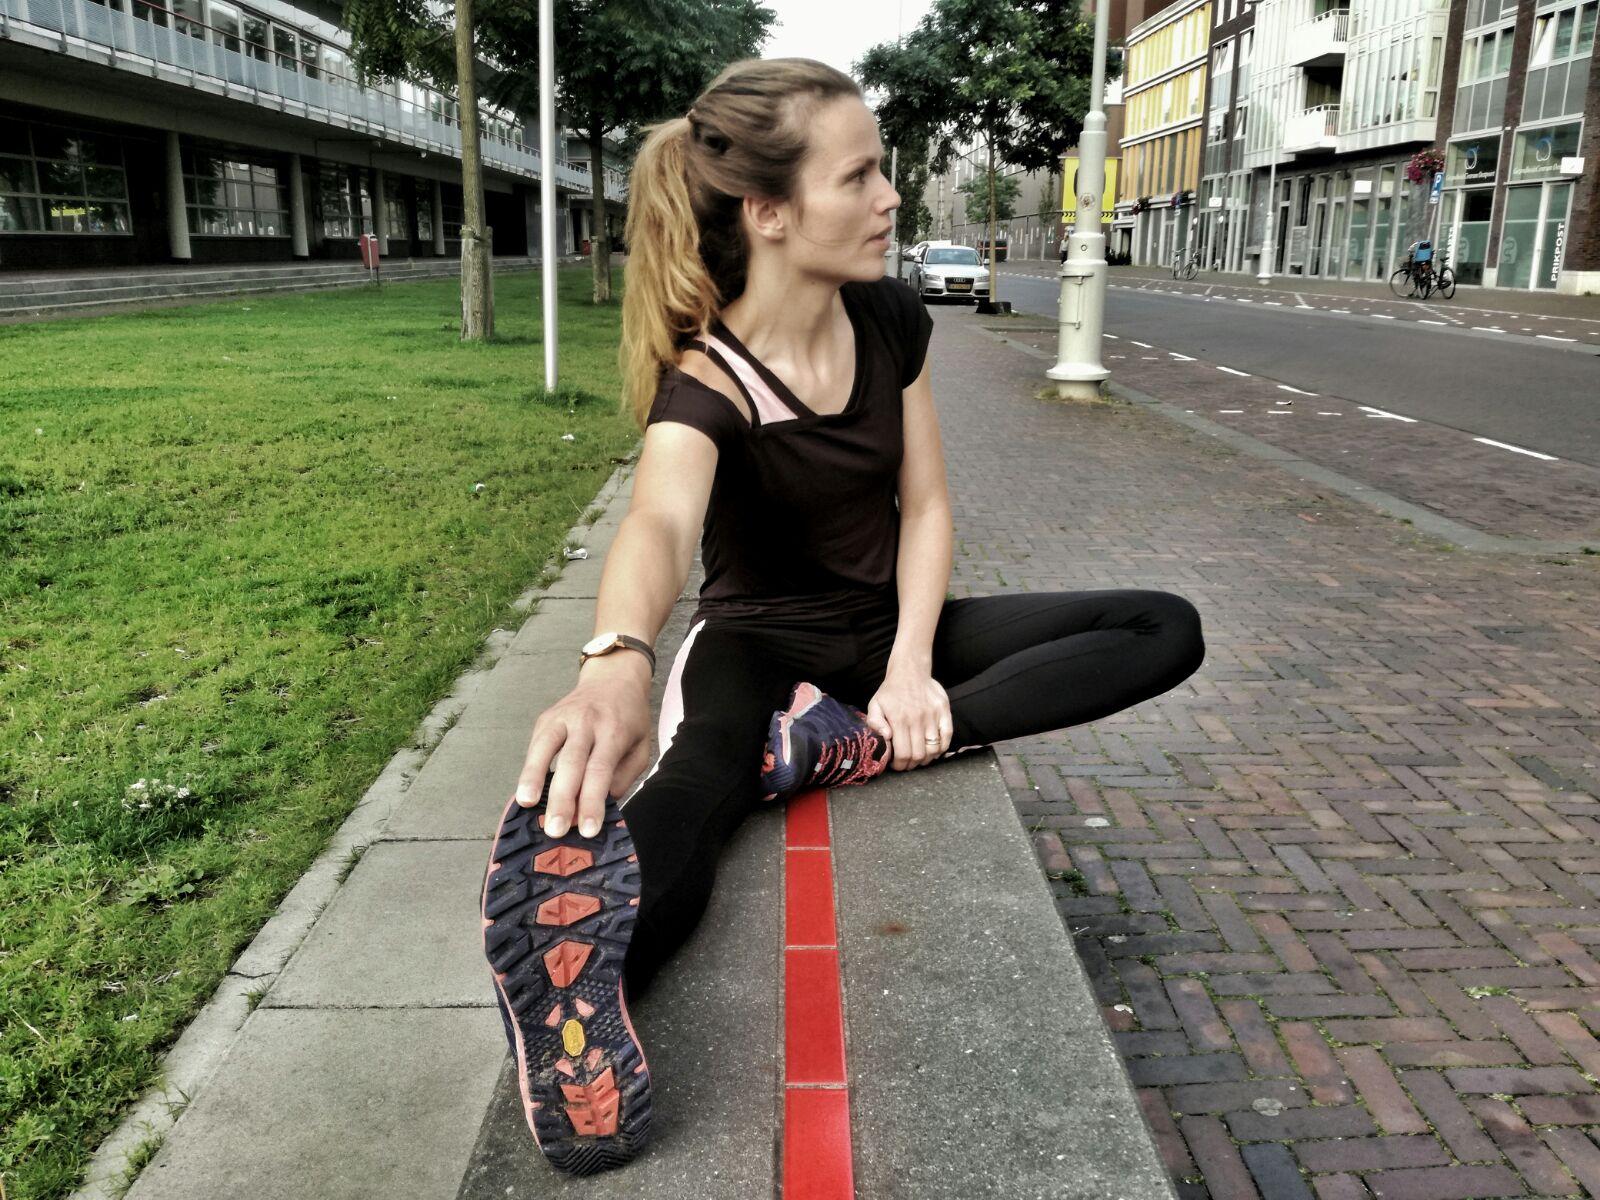 Review: Hunkemöller sportswear collectie Caro_e_ - Daily Cappuccino - Lifestyle Blog